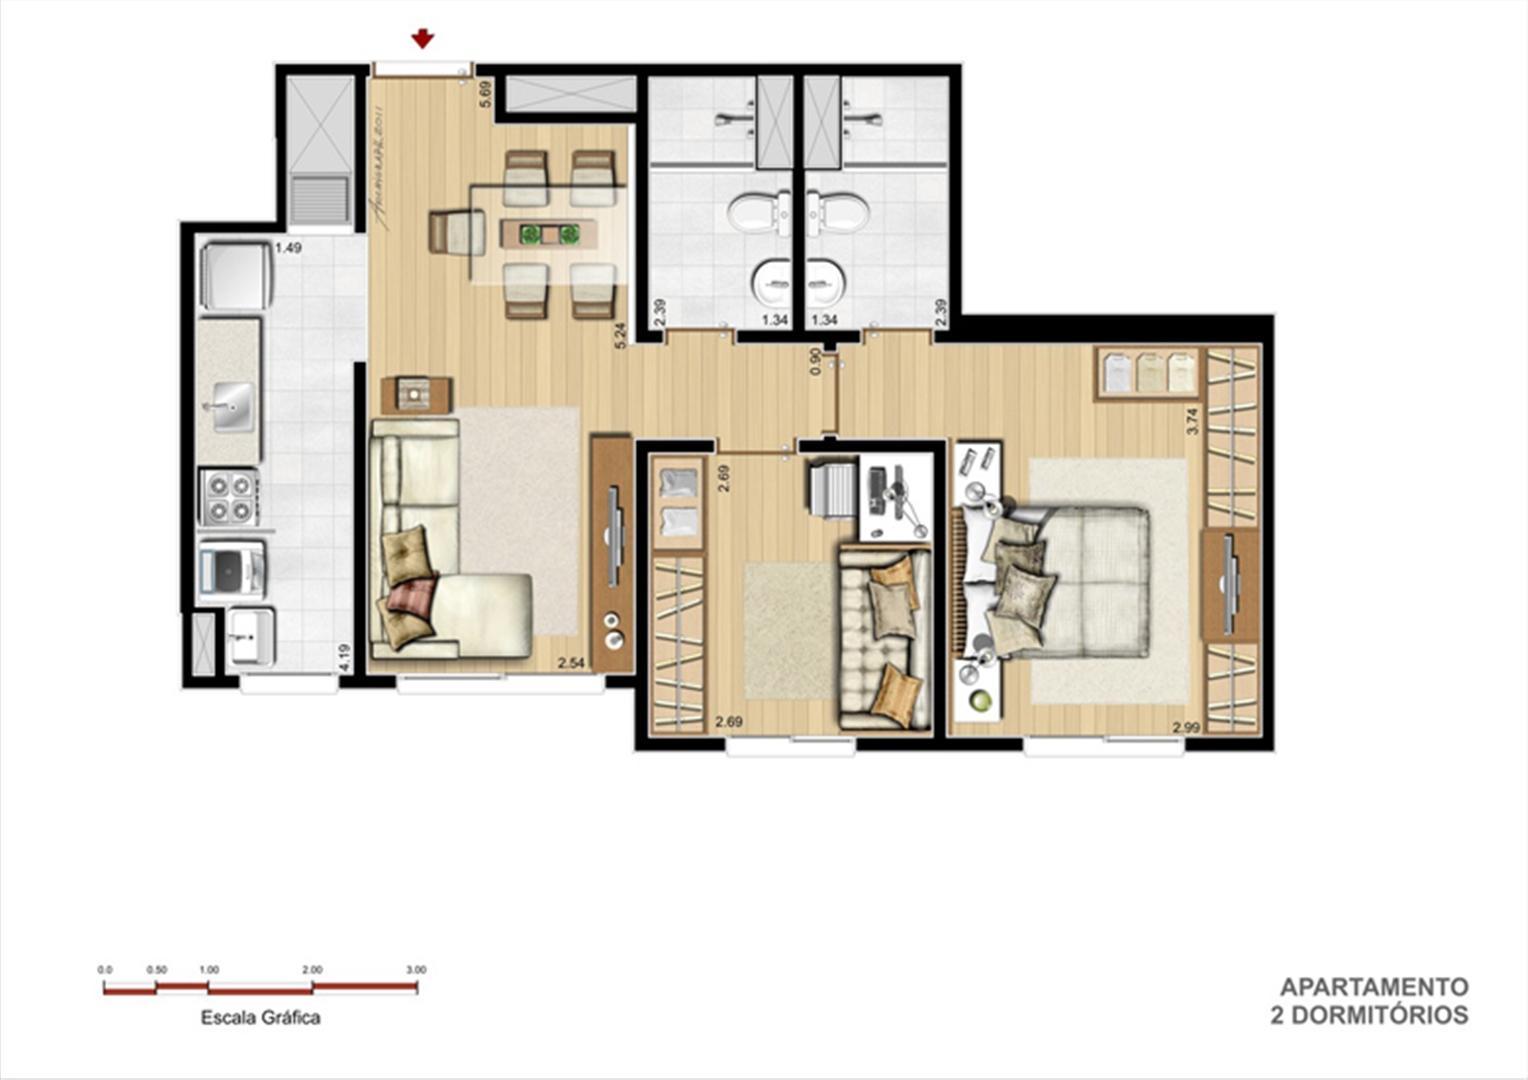 Tipo 2 dormitórios | Supera Condomínio Clube – Apartamento na  Cavalhada - Porto Alegre - Rio Grande do Sul